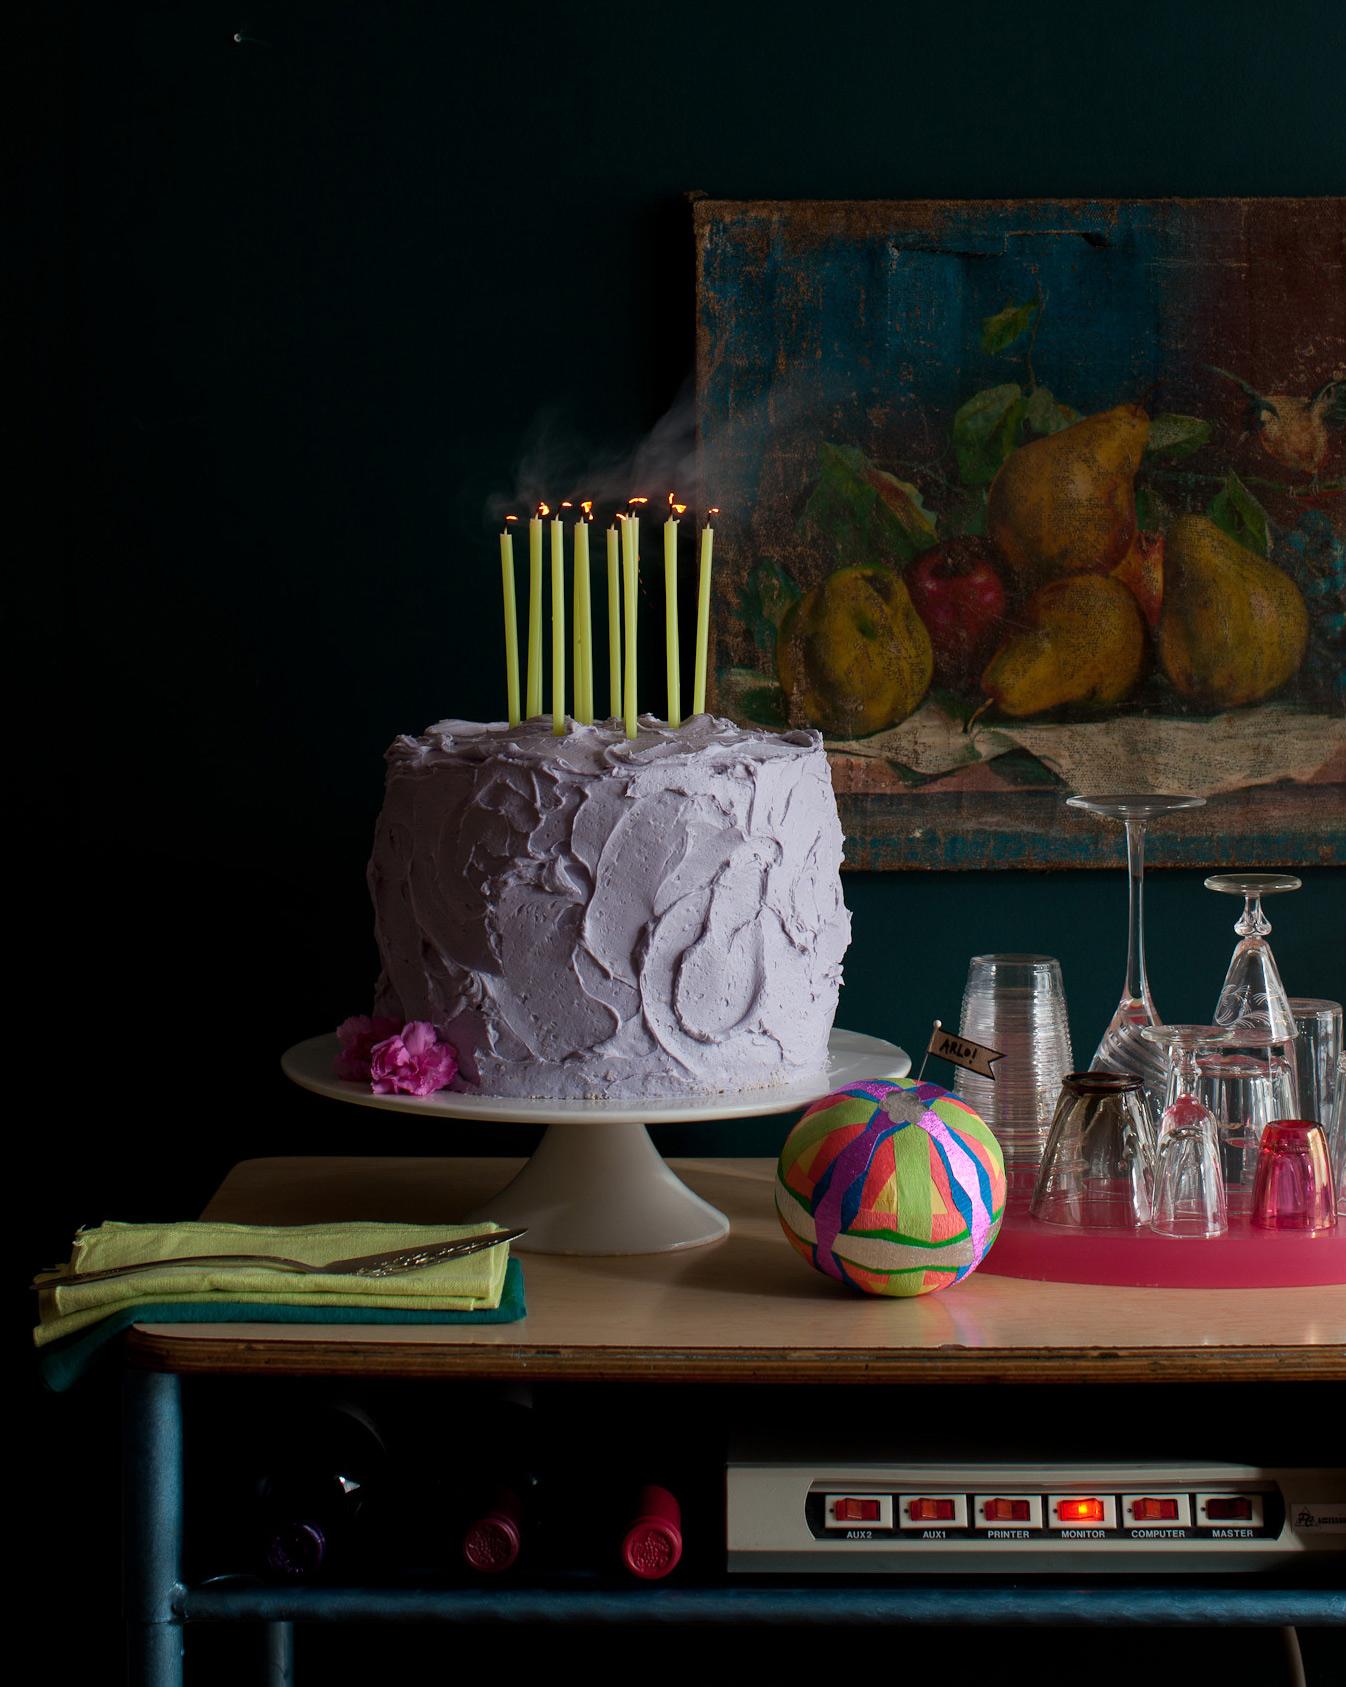 BirthdayCake_Candles_MollyFitzsimons_PropStylist.jpg